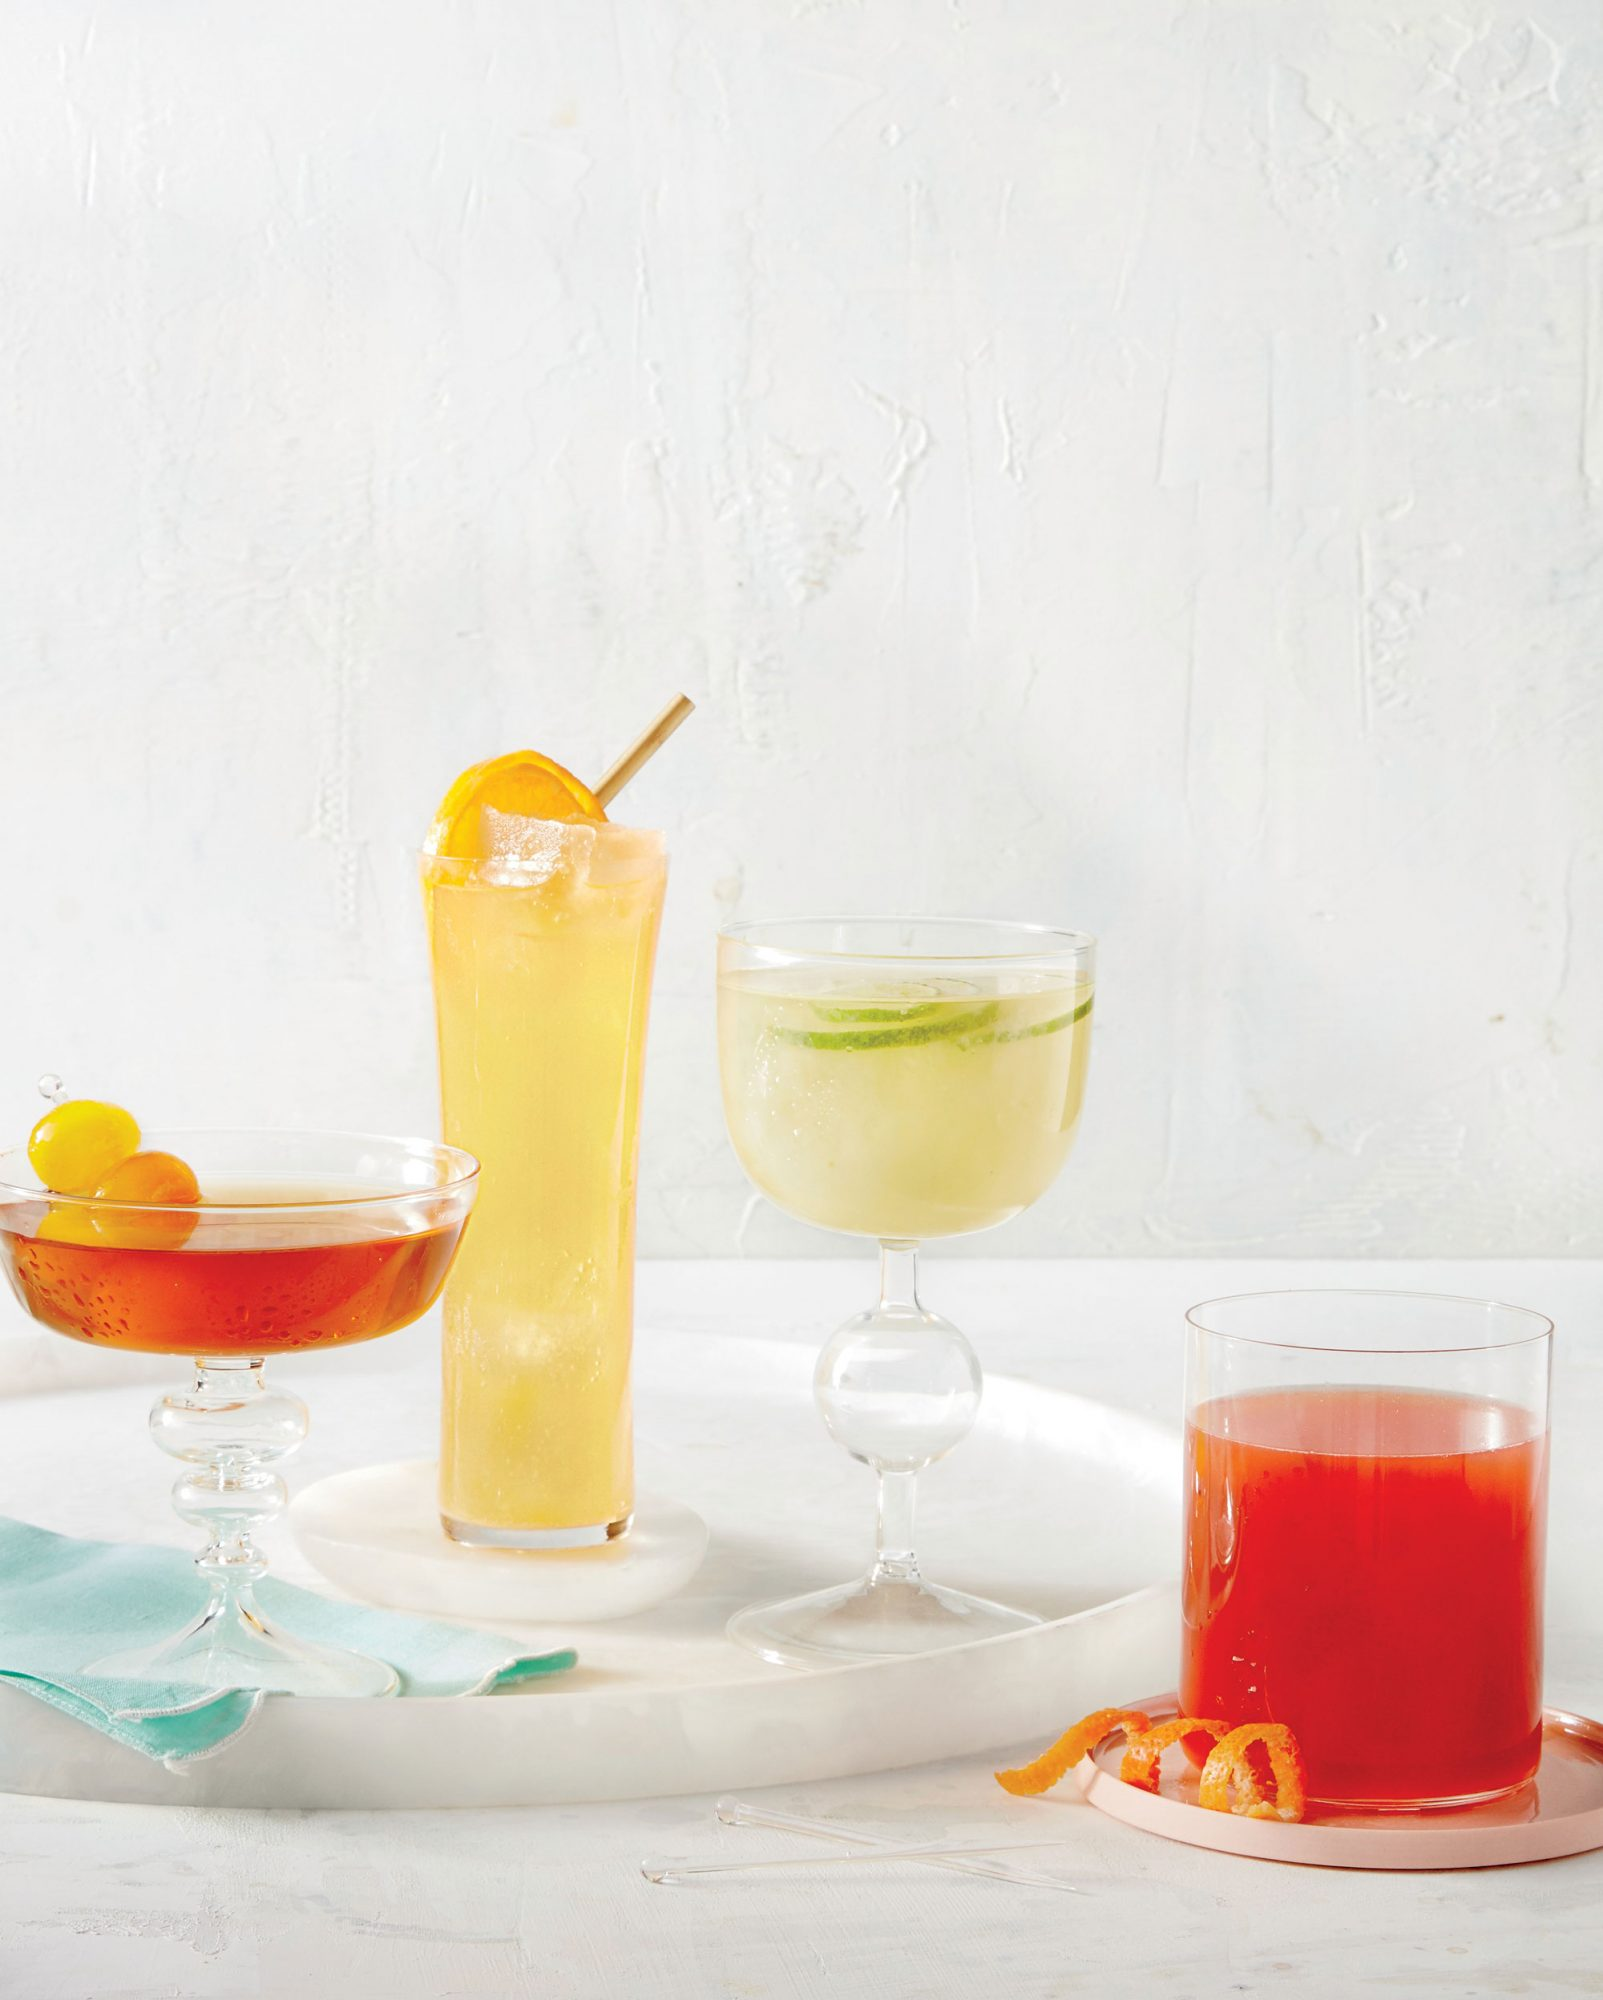 Ginger-Lime Daiquiri